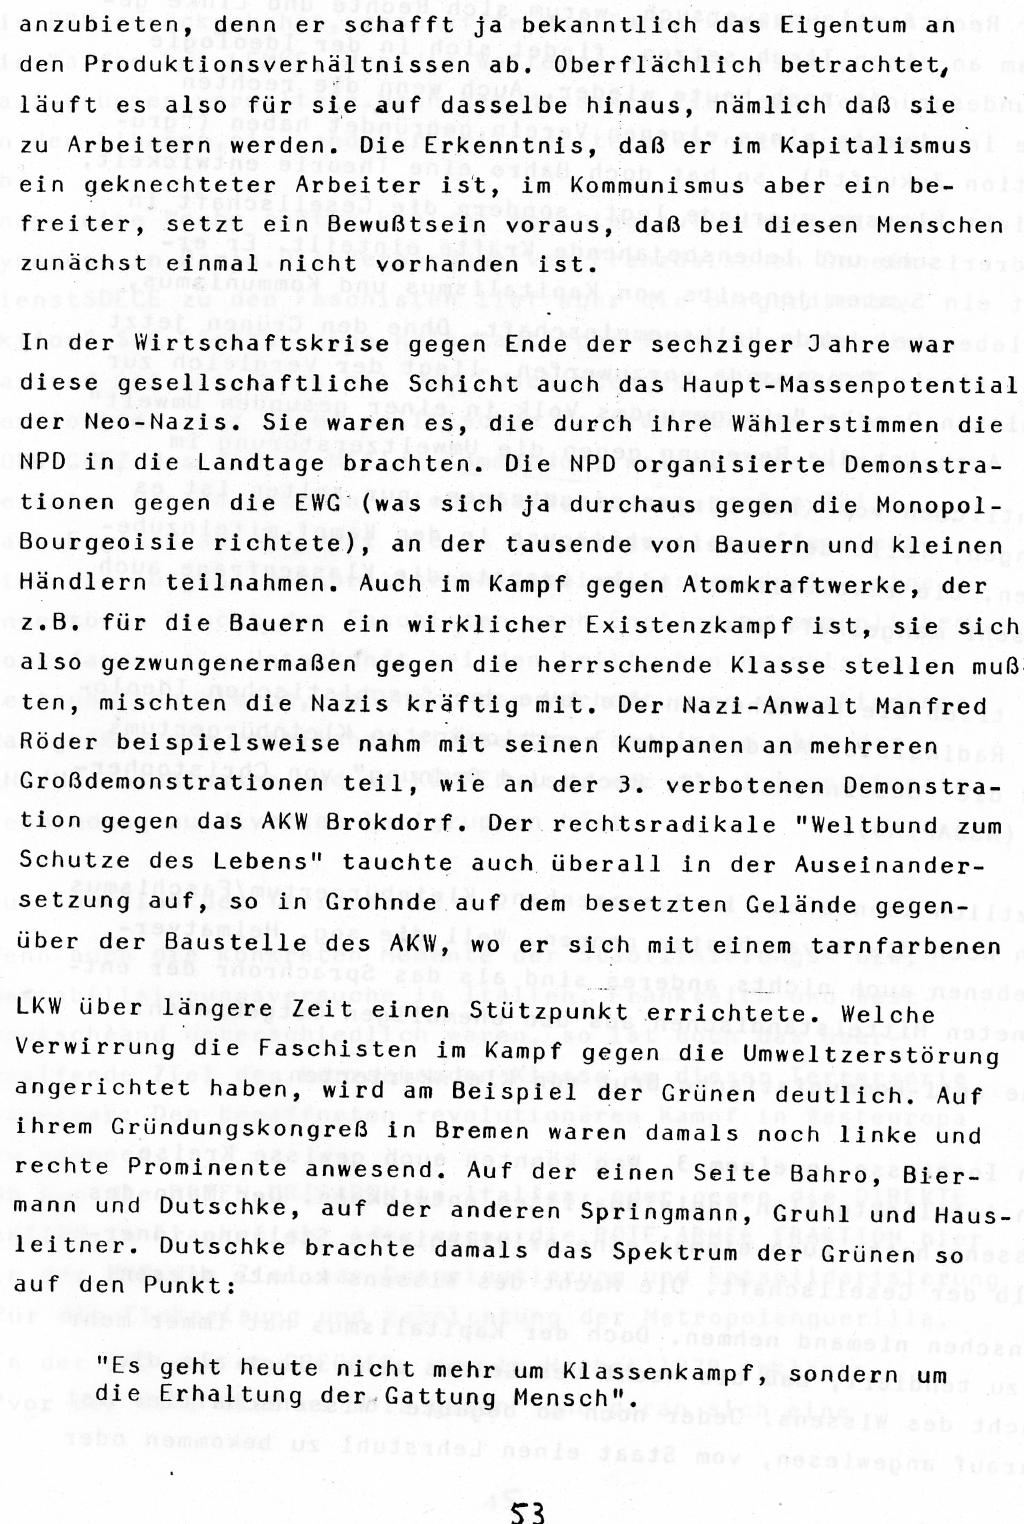 Berlin_1983_Autonome_Gruppen_Faschismus_im_Kapitalismus_53